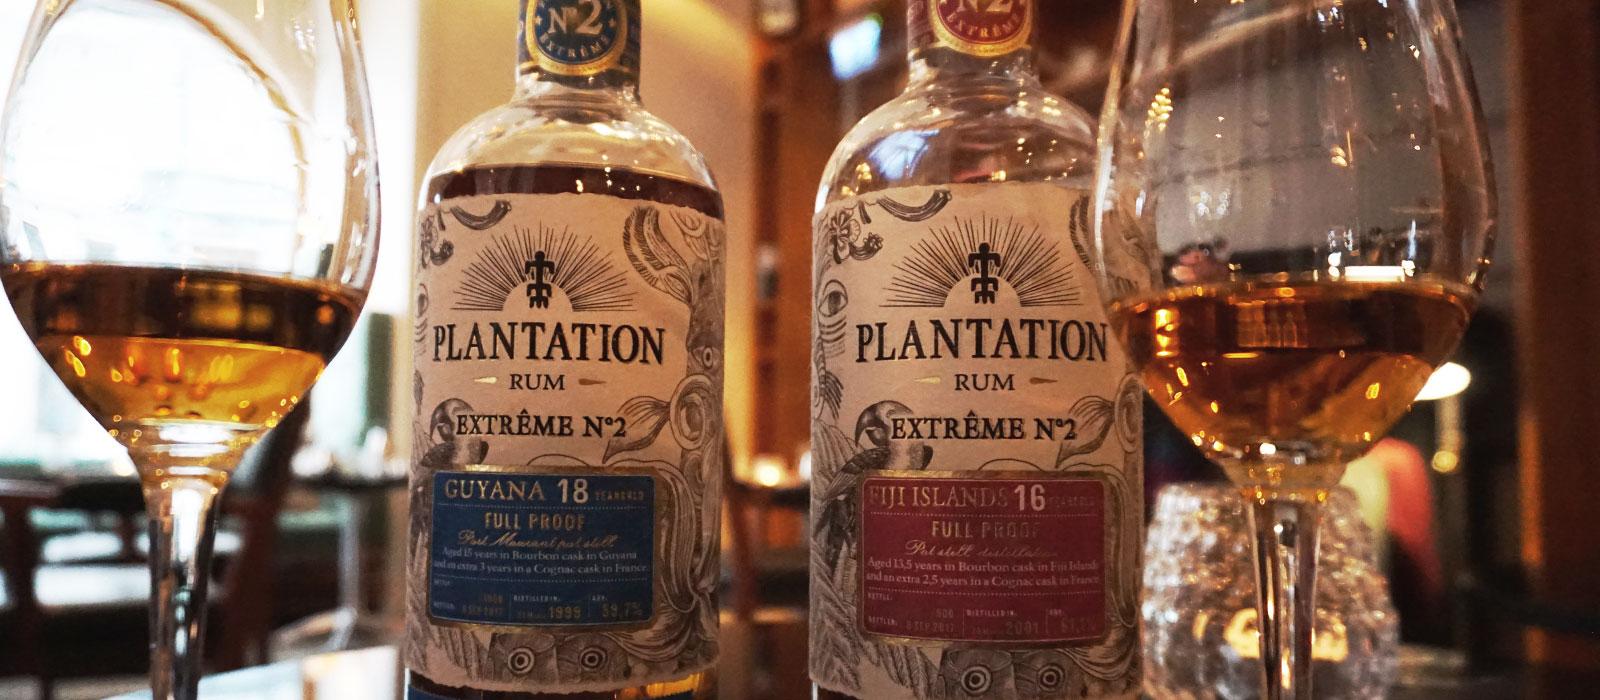 Provning av Plantation Extrême No.2